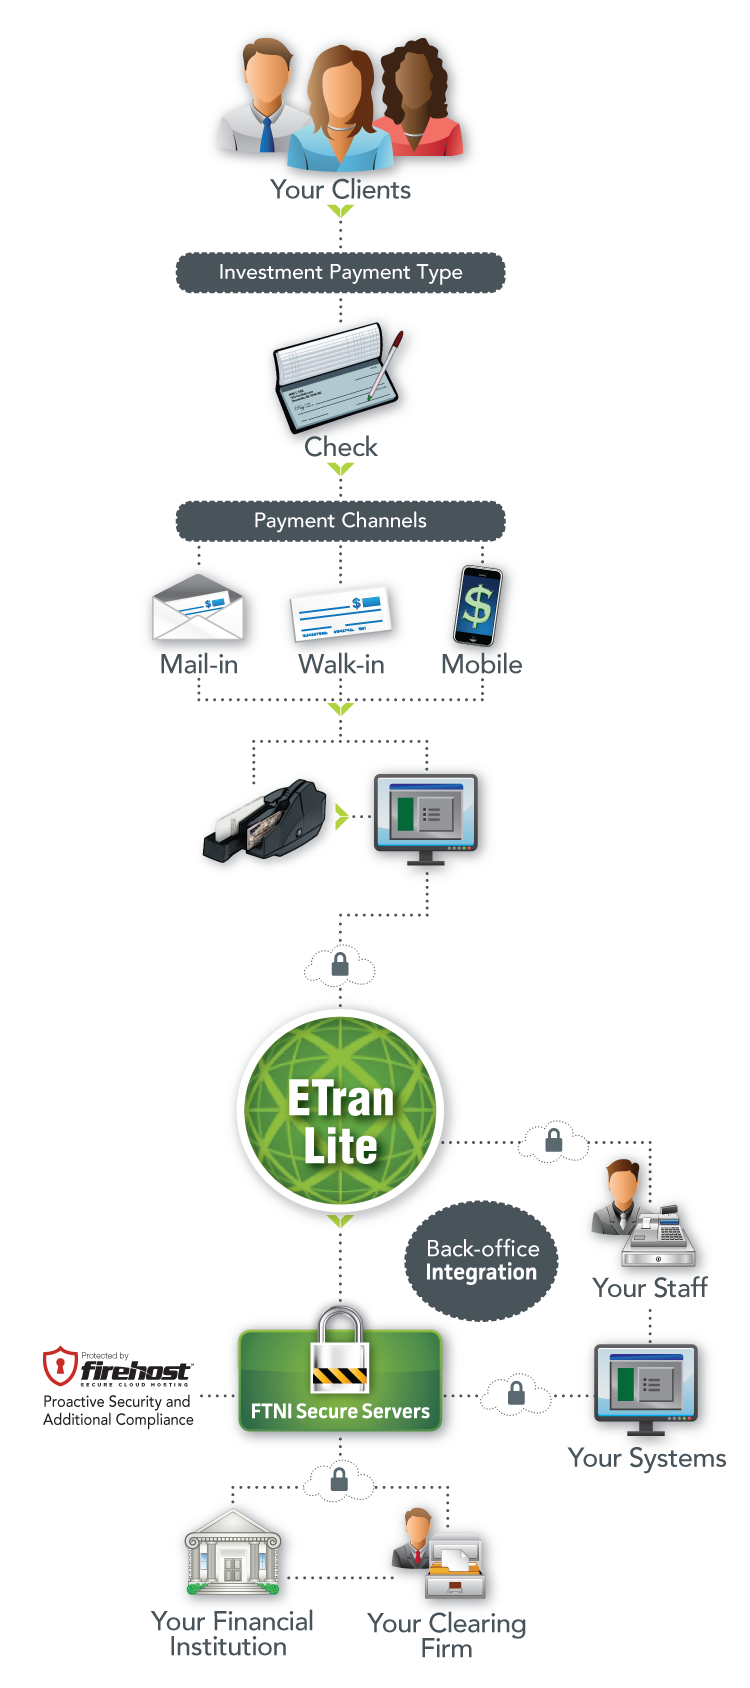 ETran Lite Check Imaging - FTNI